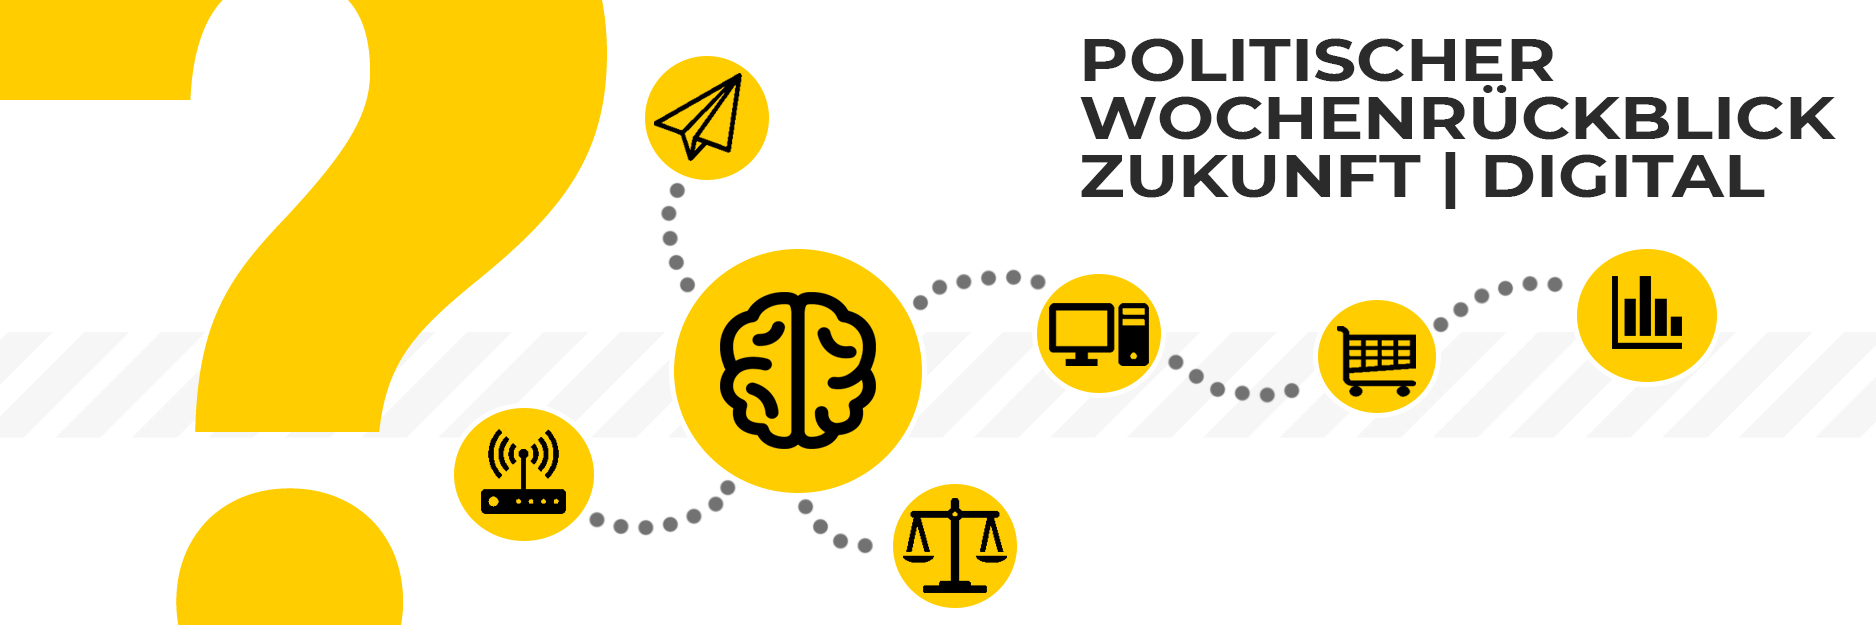 #6 Wochenrückblick Politik Zukunft Digitales 11. – 15. Dez. 17